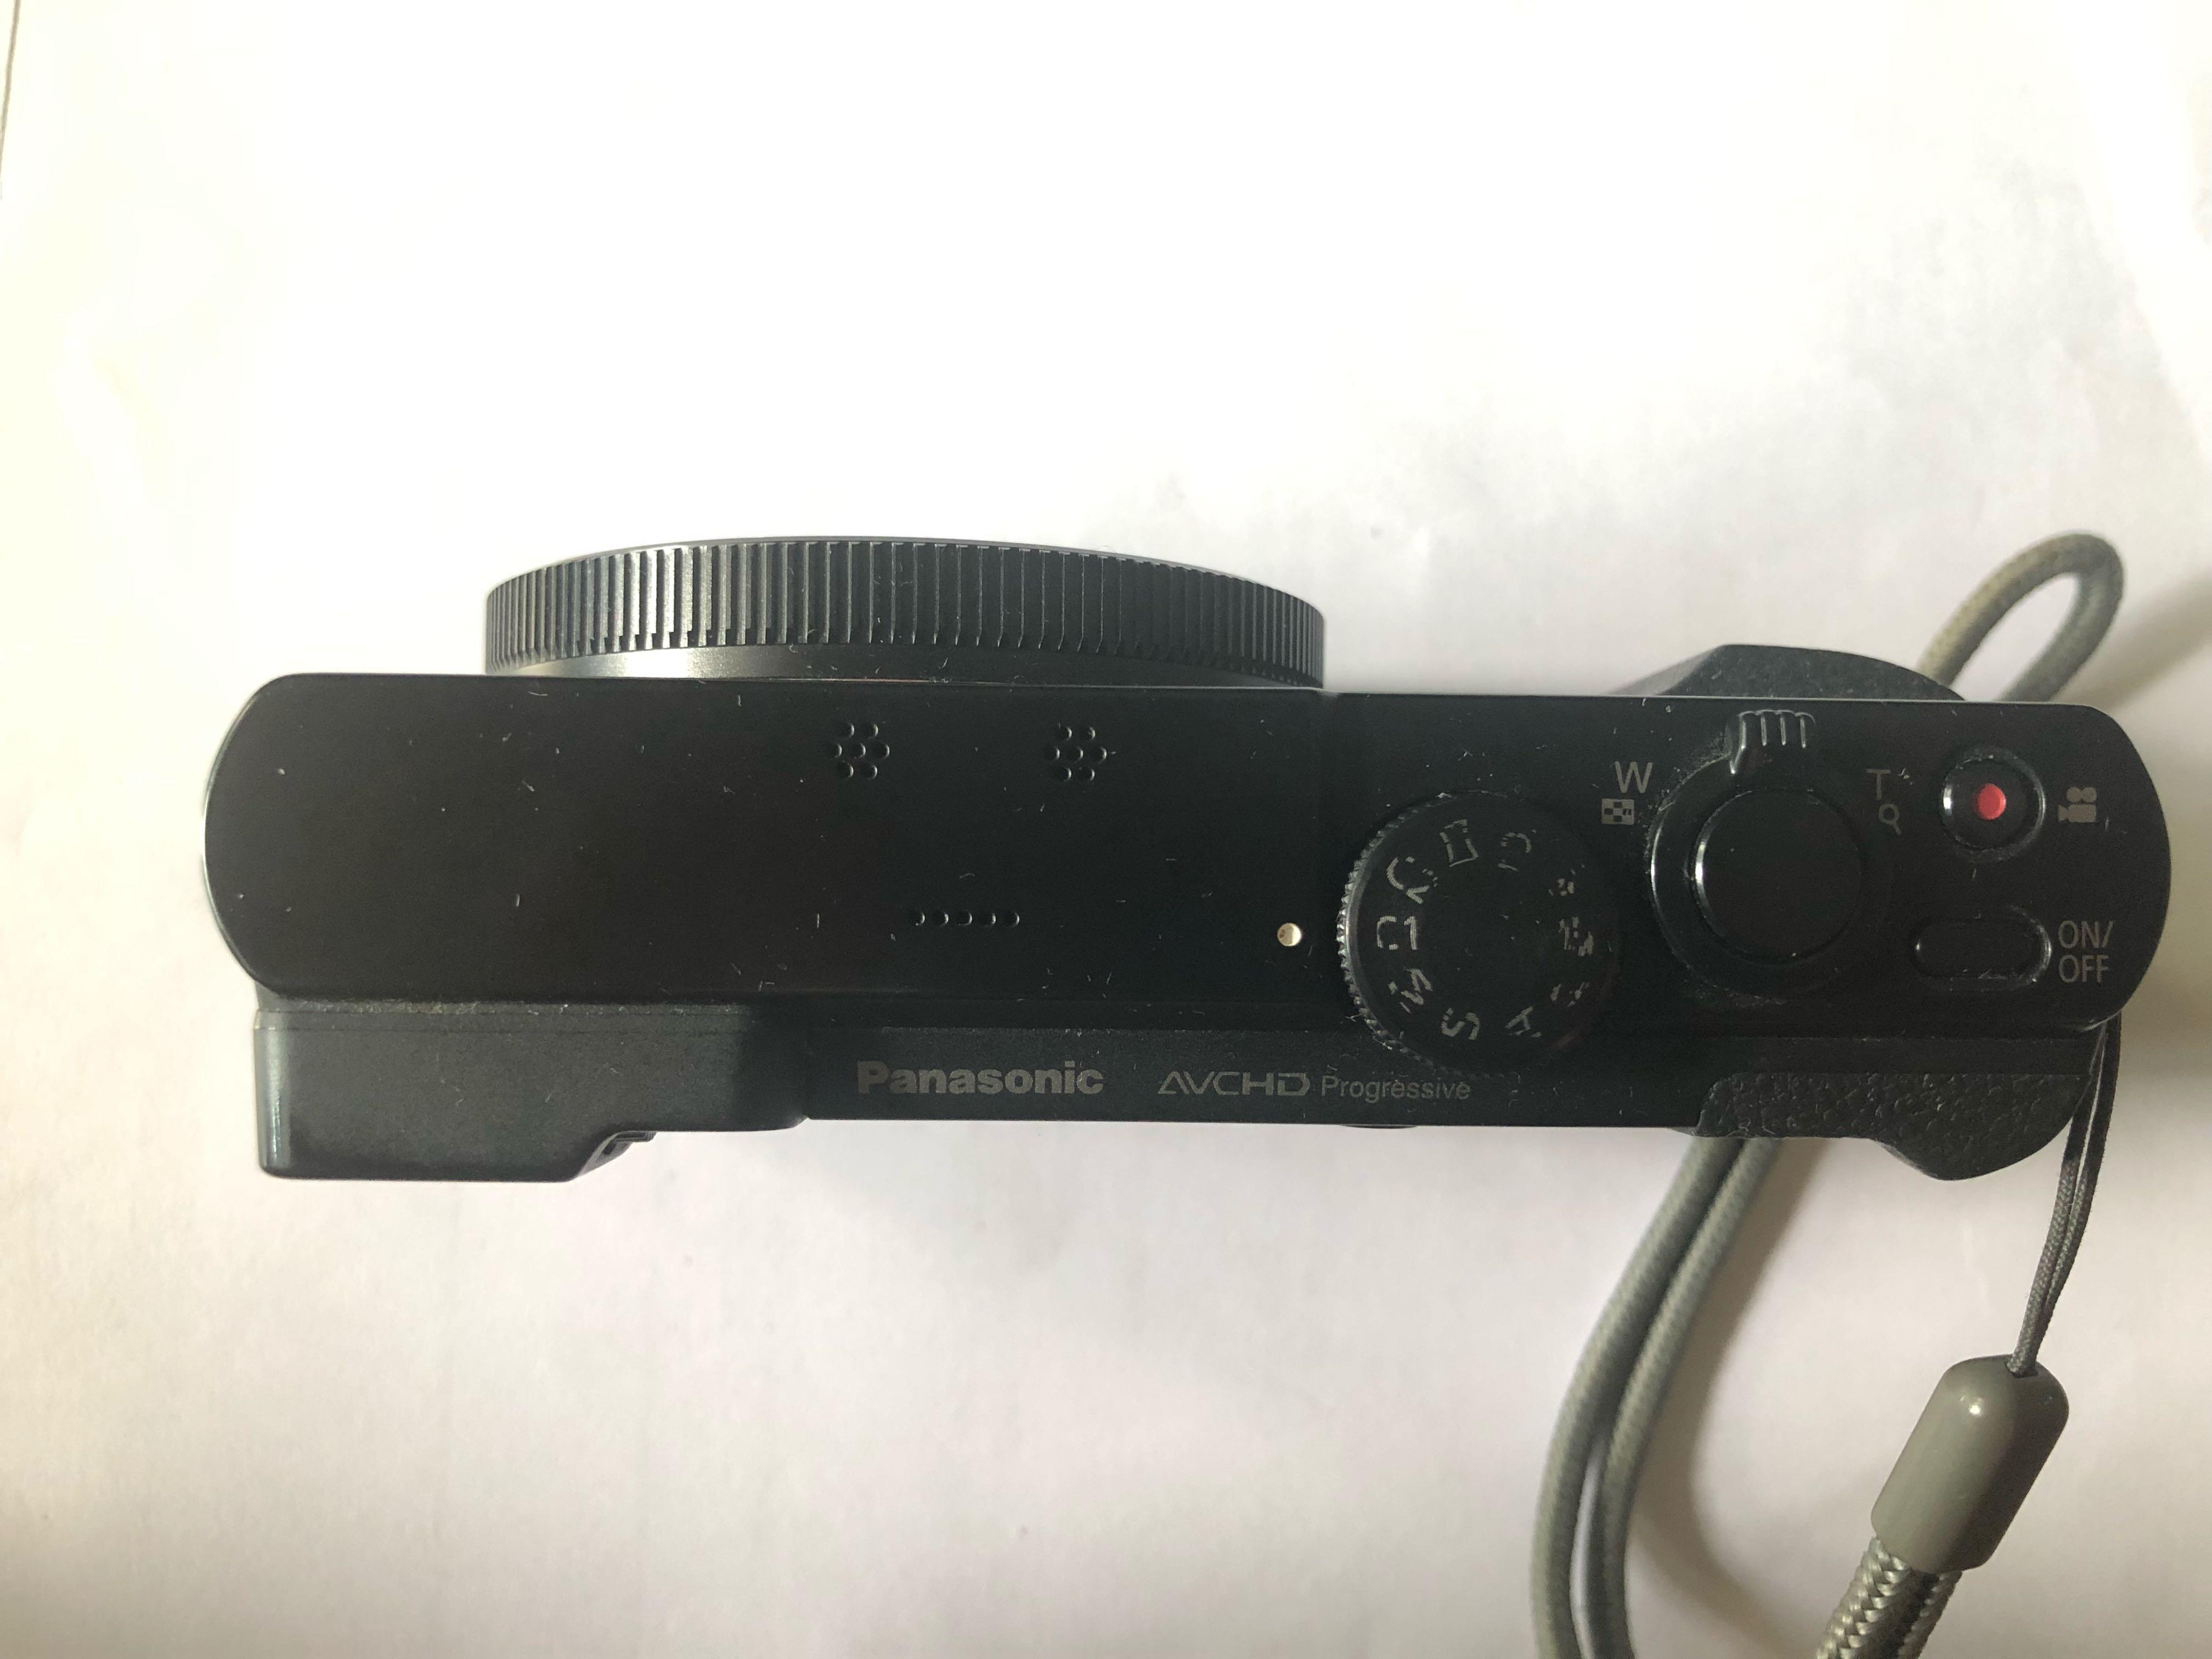 Panasonic Leica camera